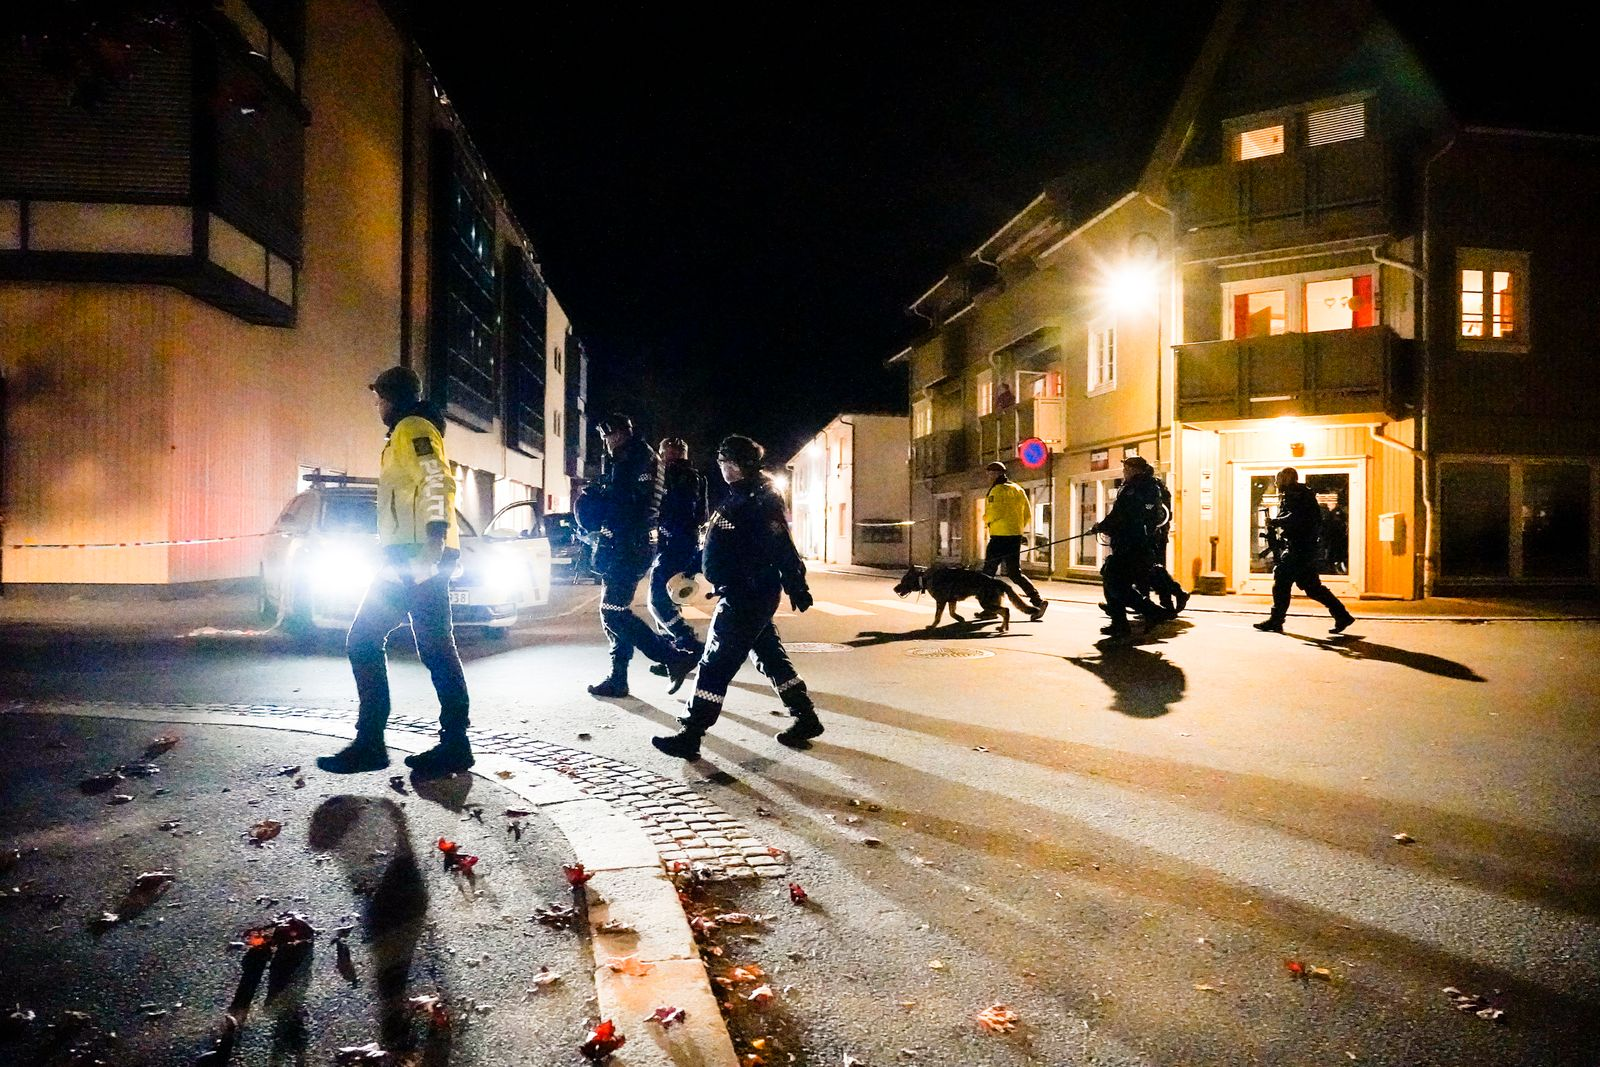 Police action in Kongsberg